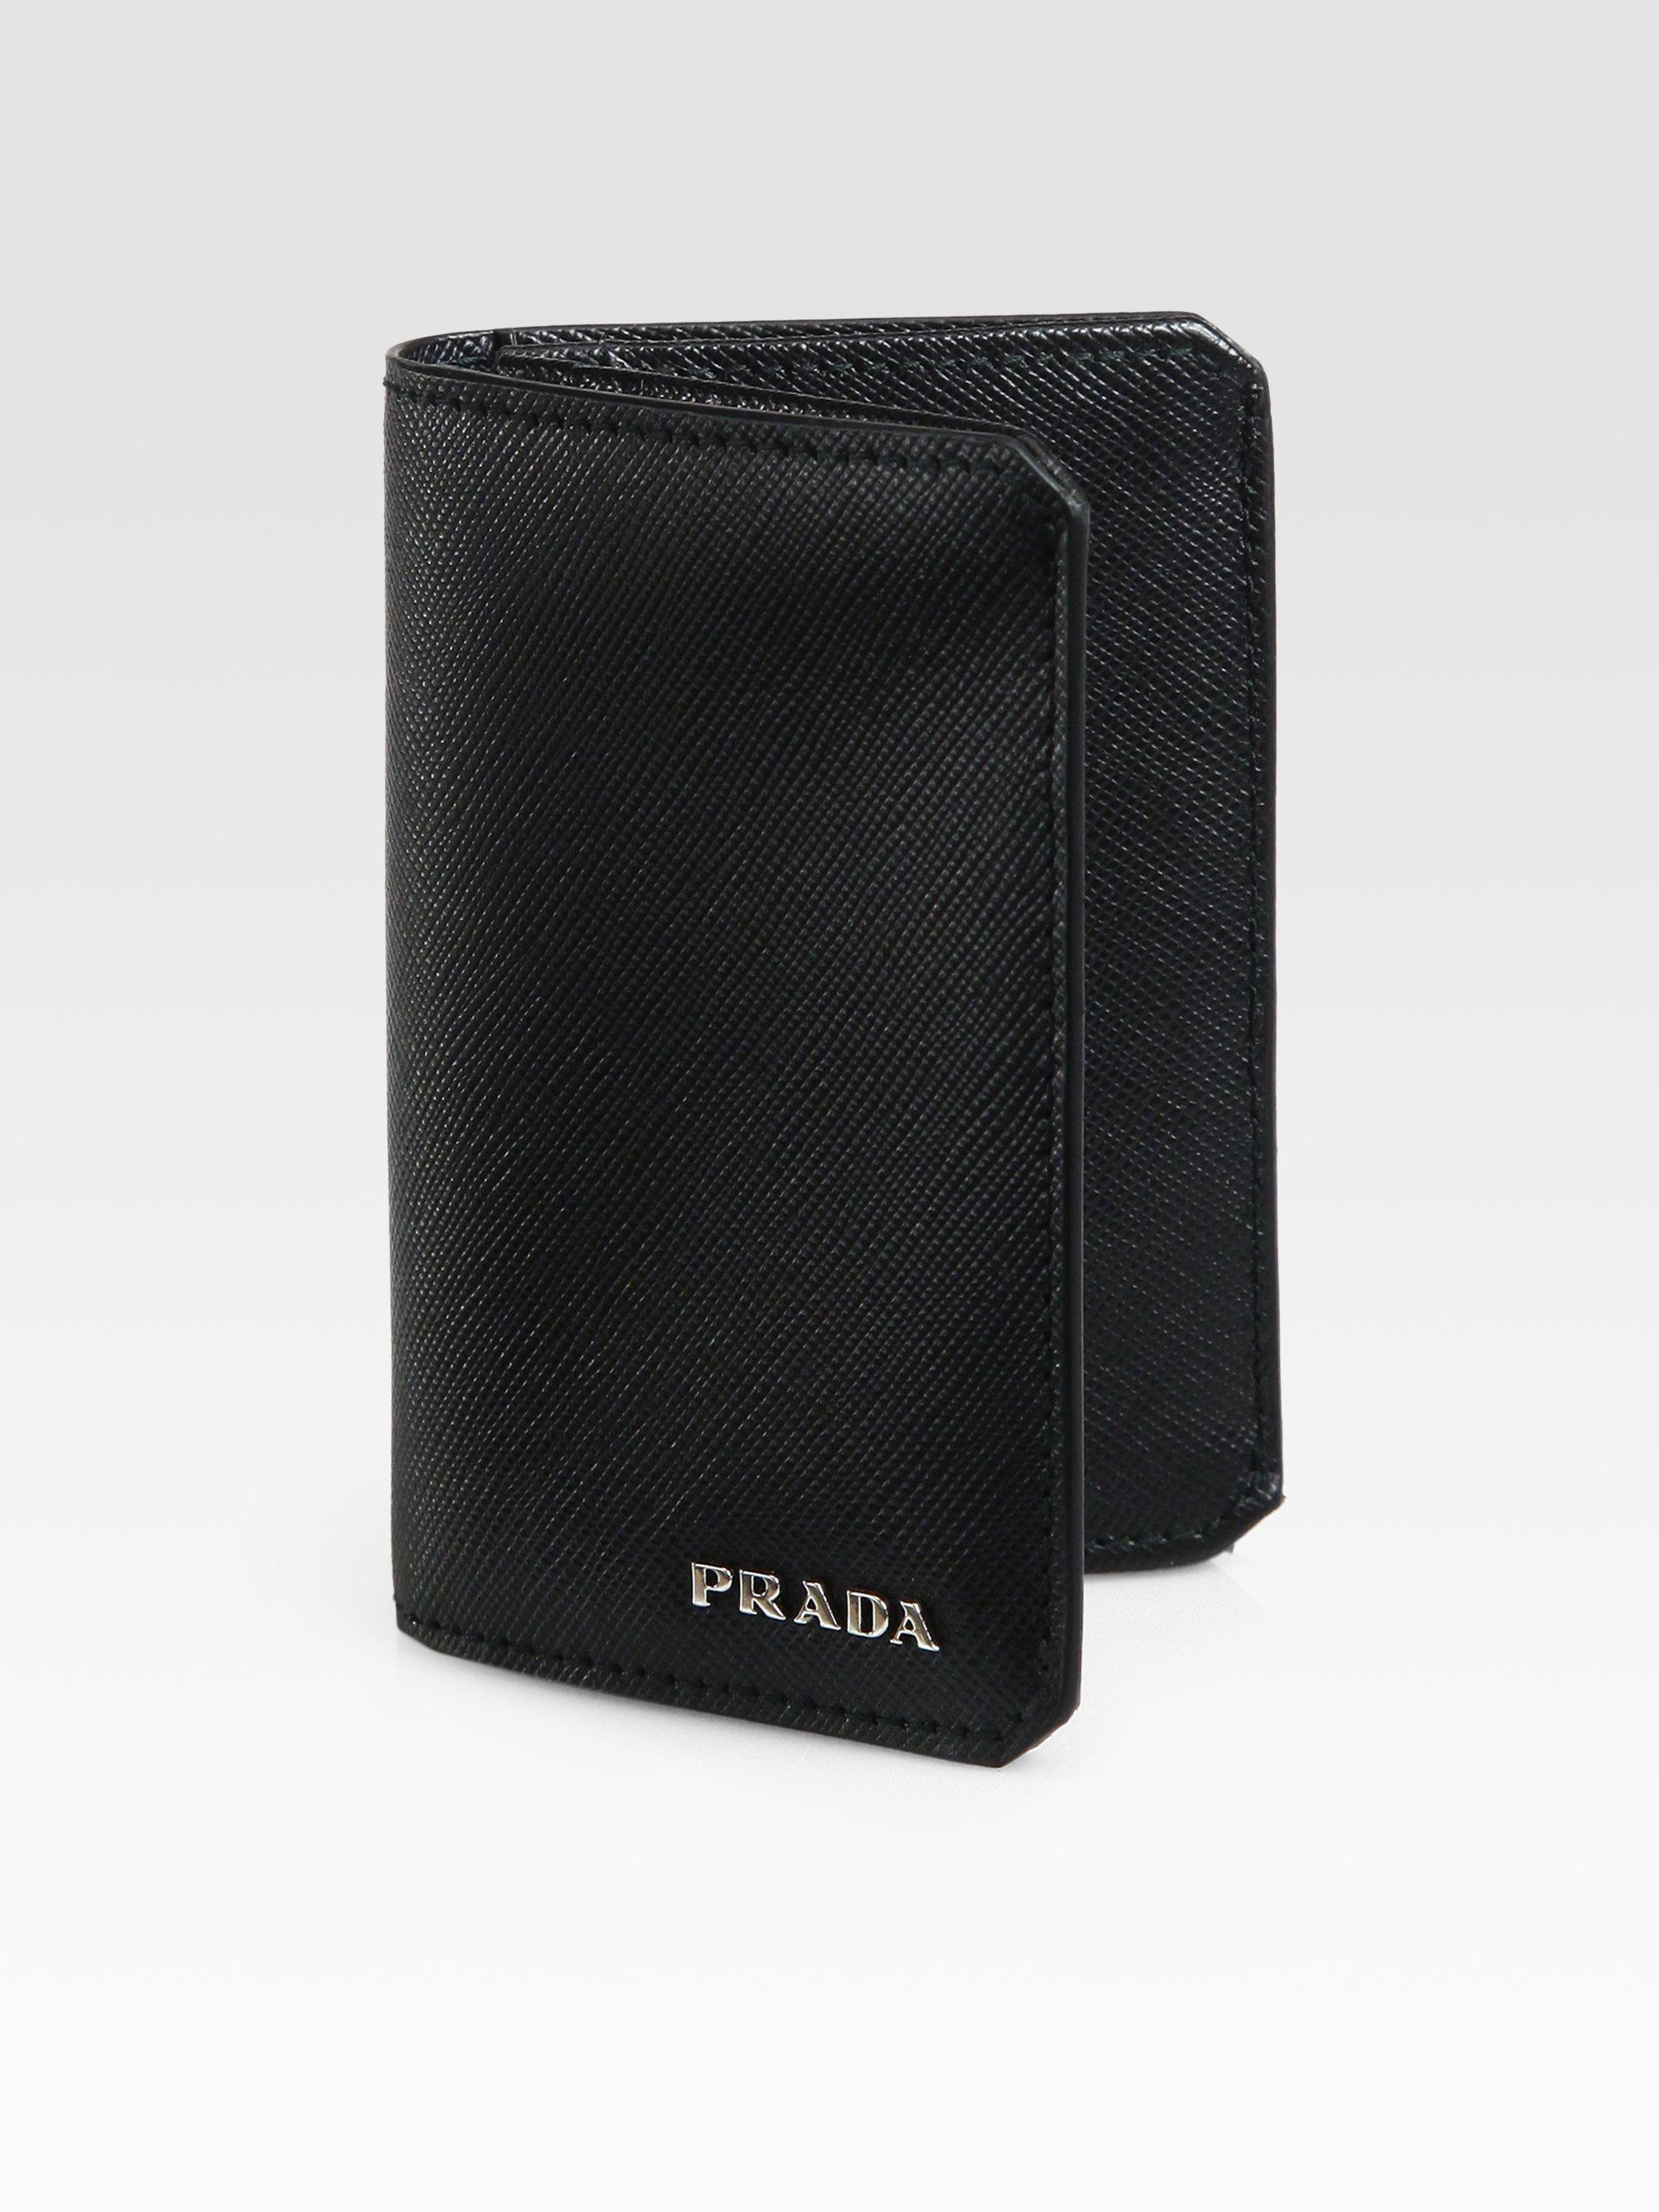 Prada credit card wallet best photo wallet justiceforkenny lyst prada saffiano leather credit card case in black for men colourmoves